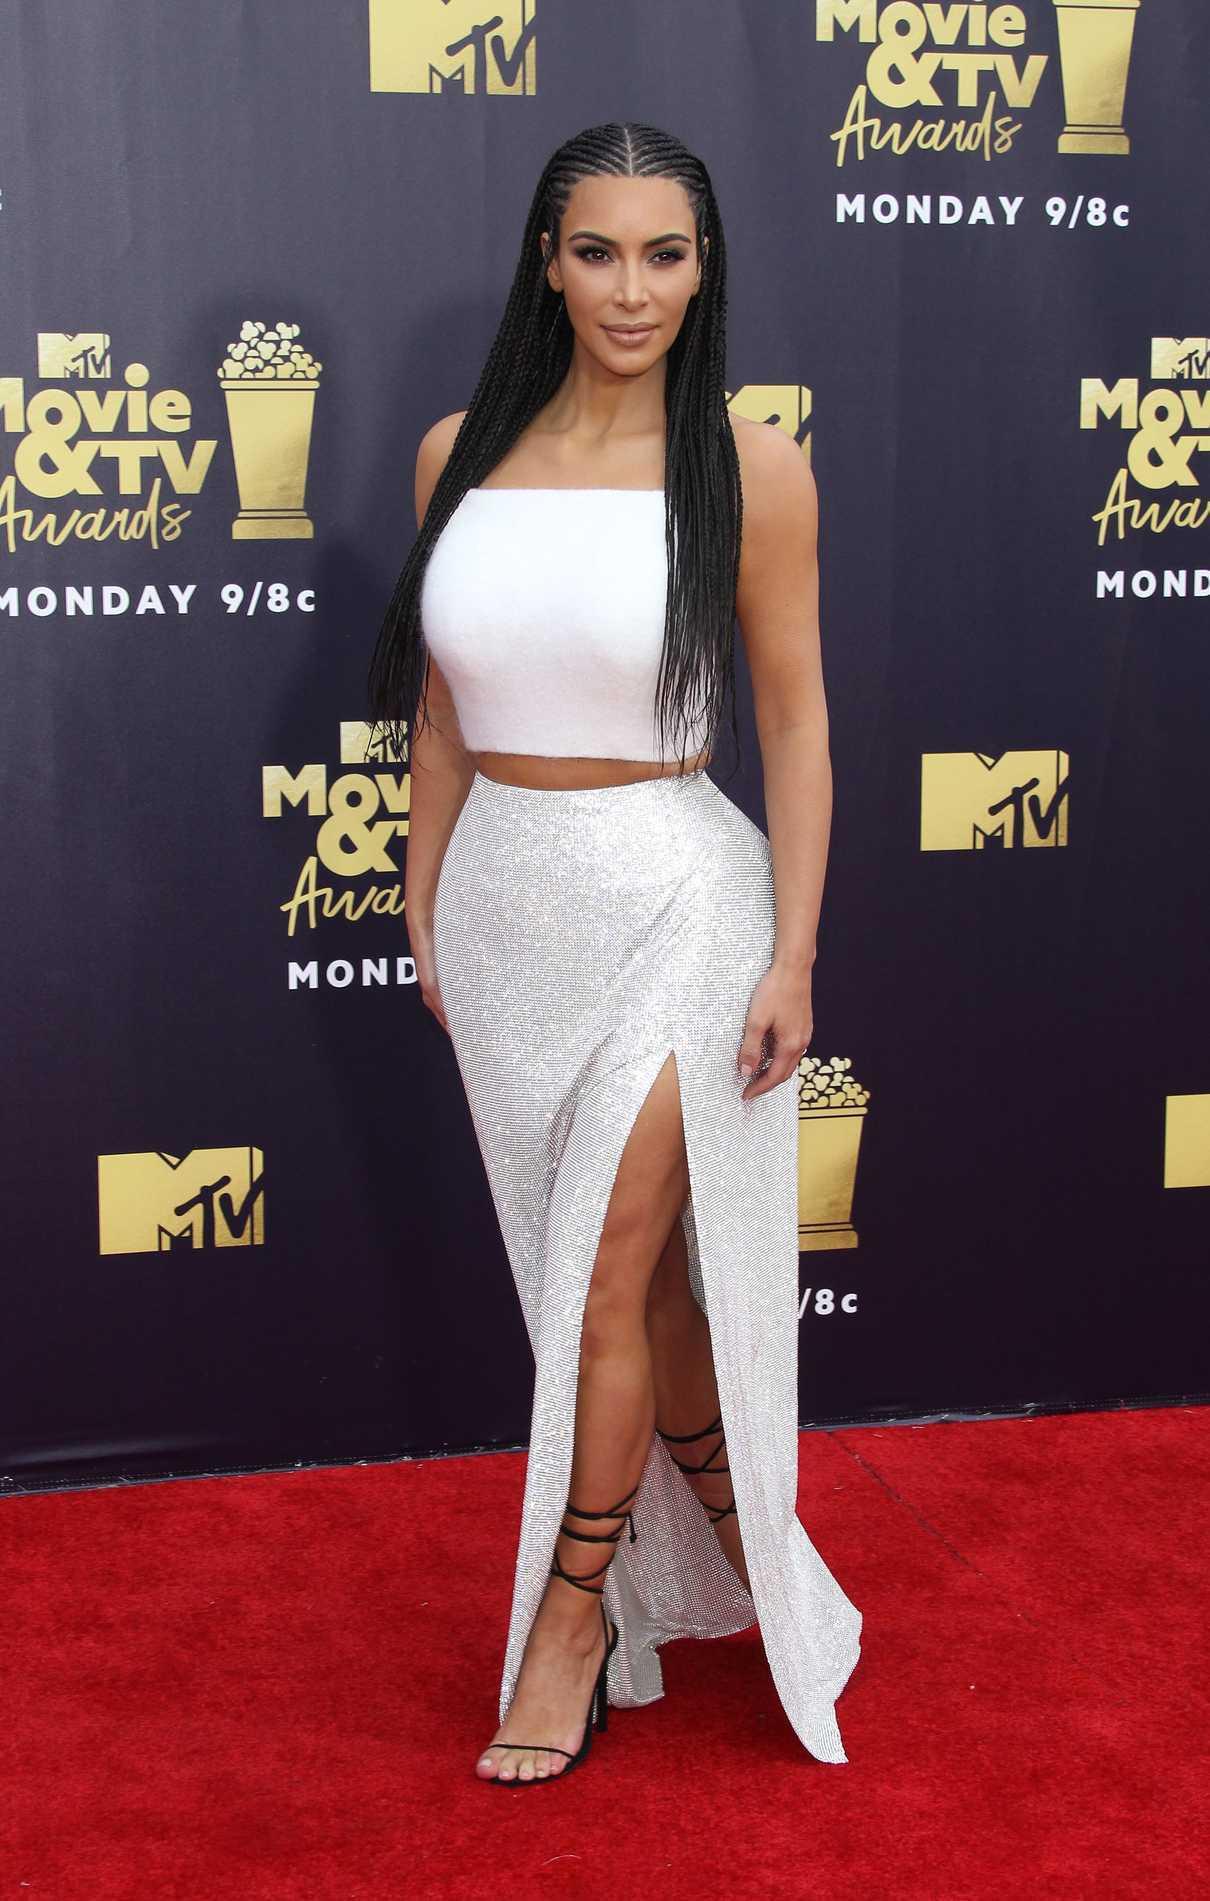 Kim Kardashian Attends the 2018 MTV Movie and TV Awards in Santa Monica 06/16/2018-1